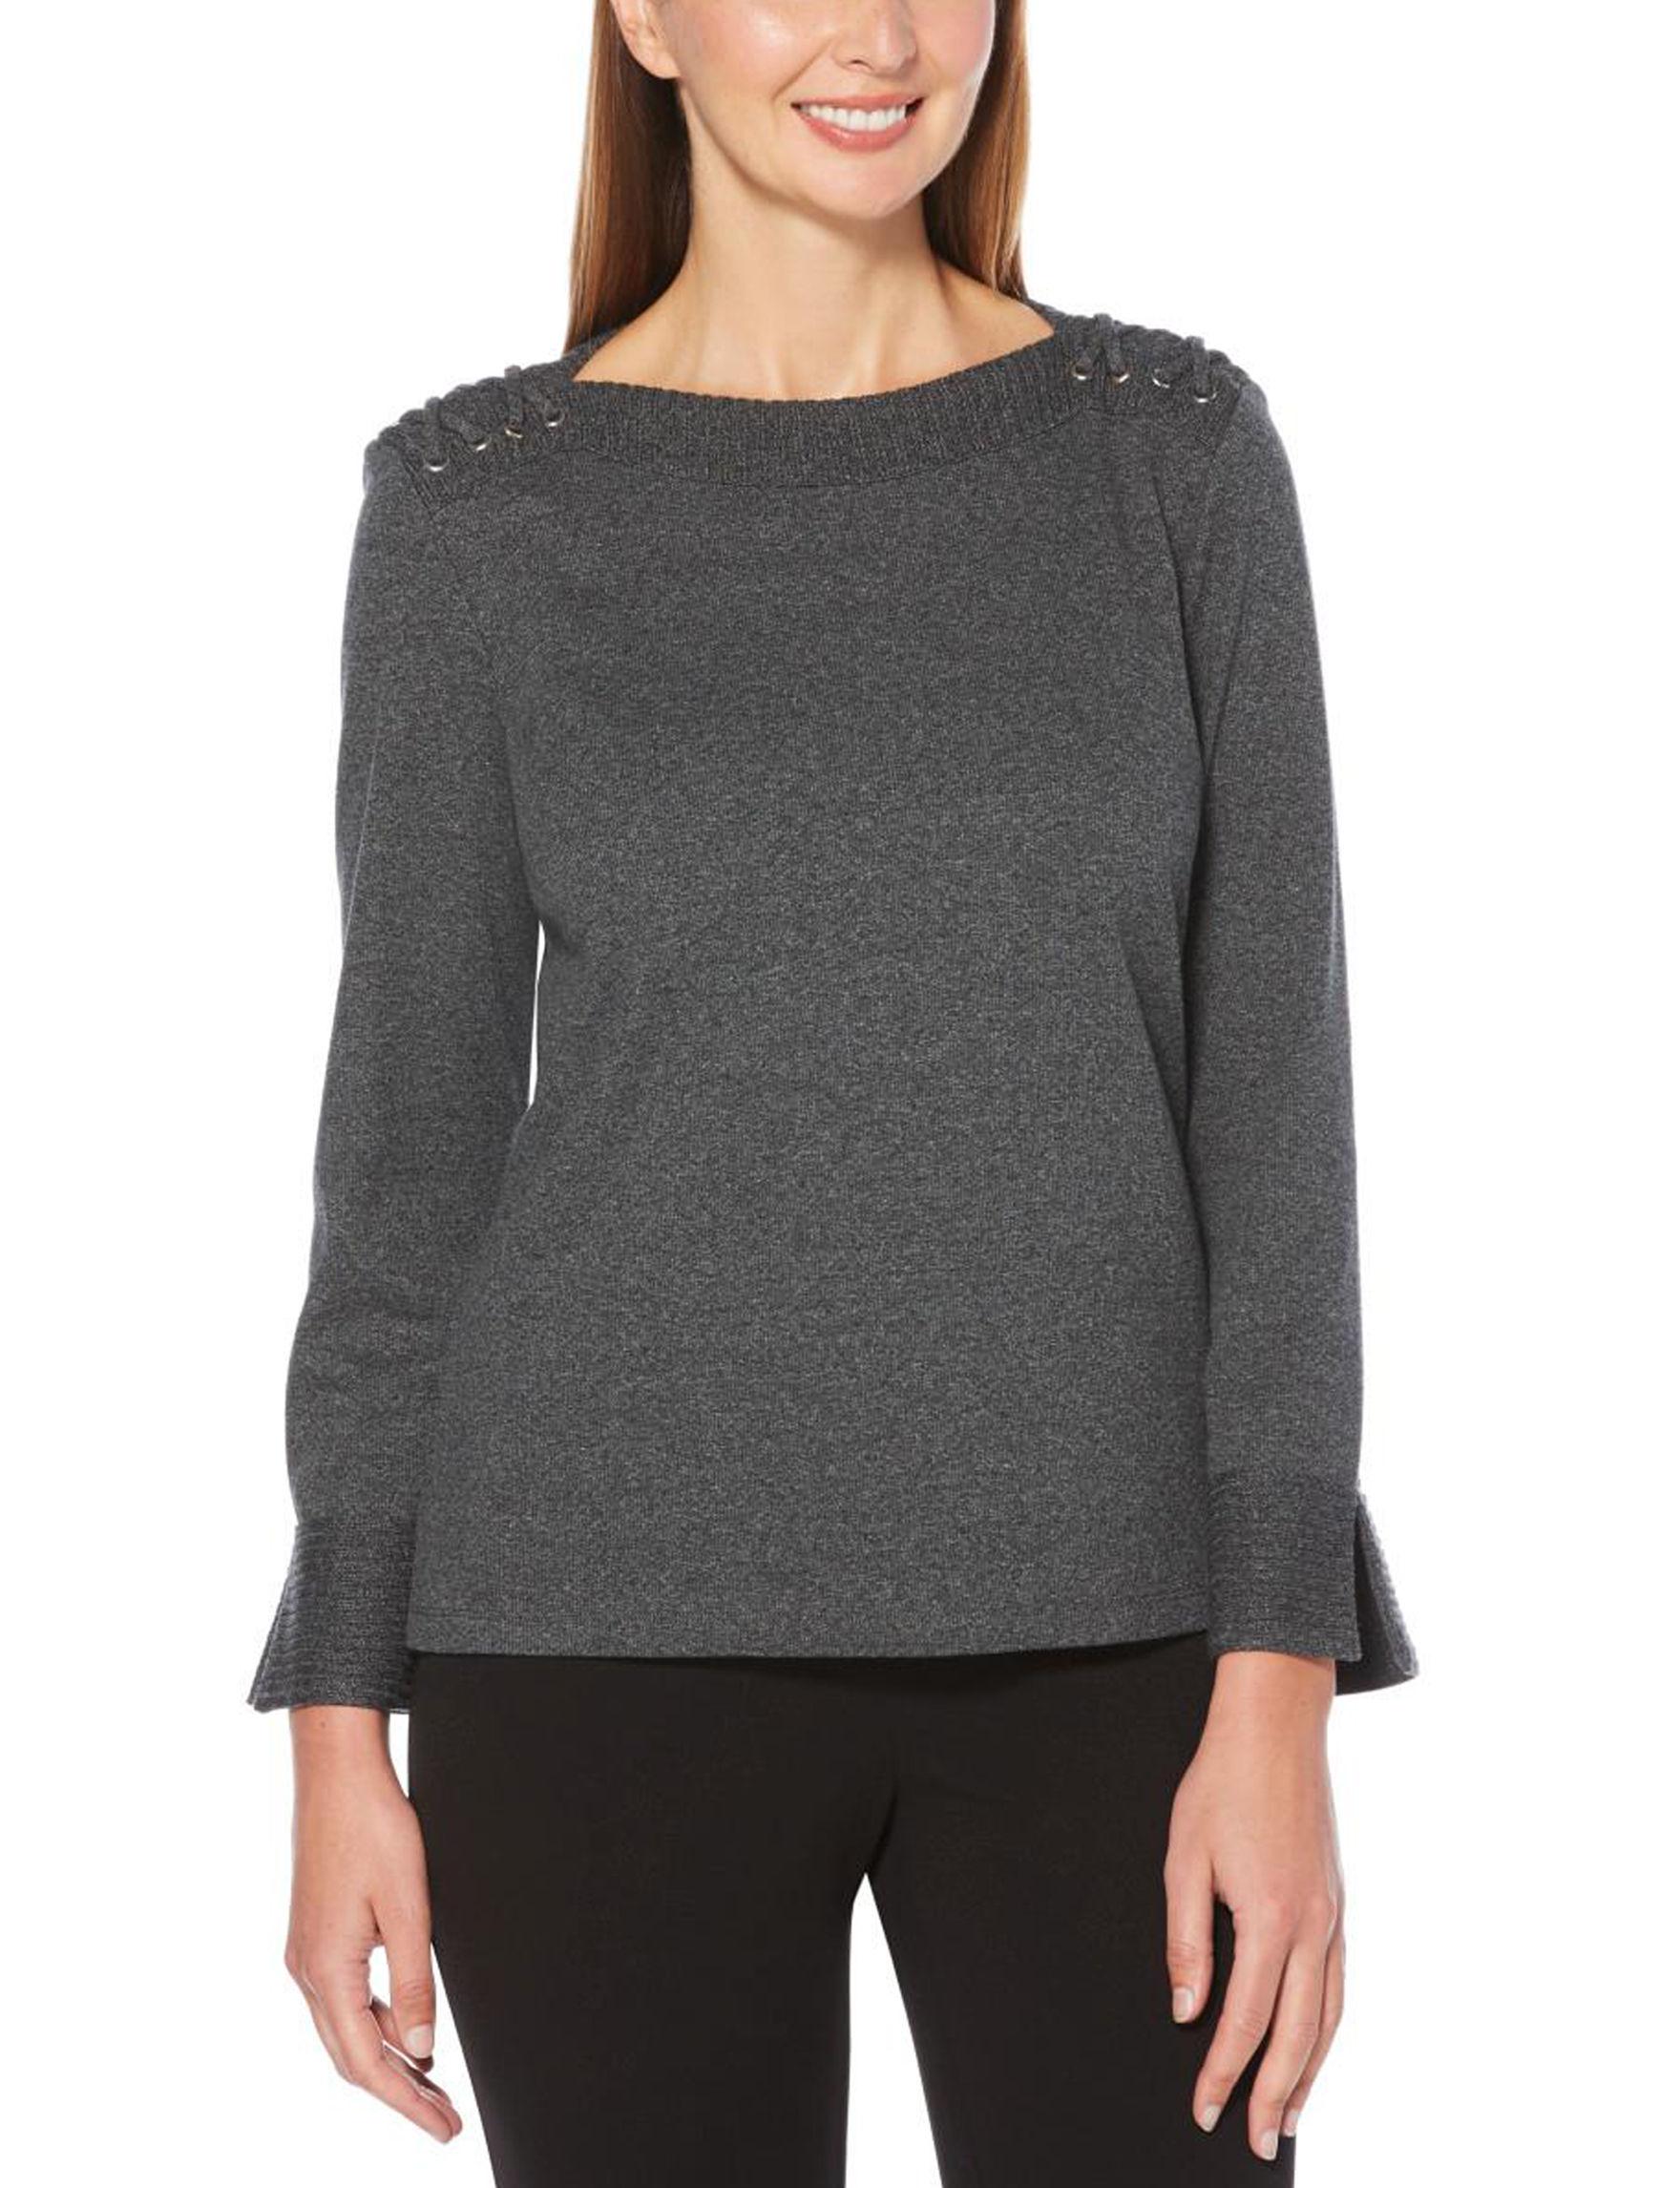 Rafaella Charcoal Shirts & Blouses